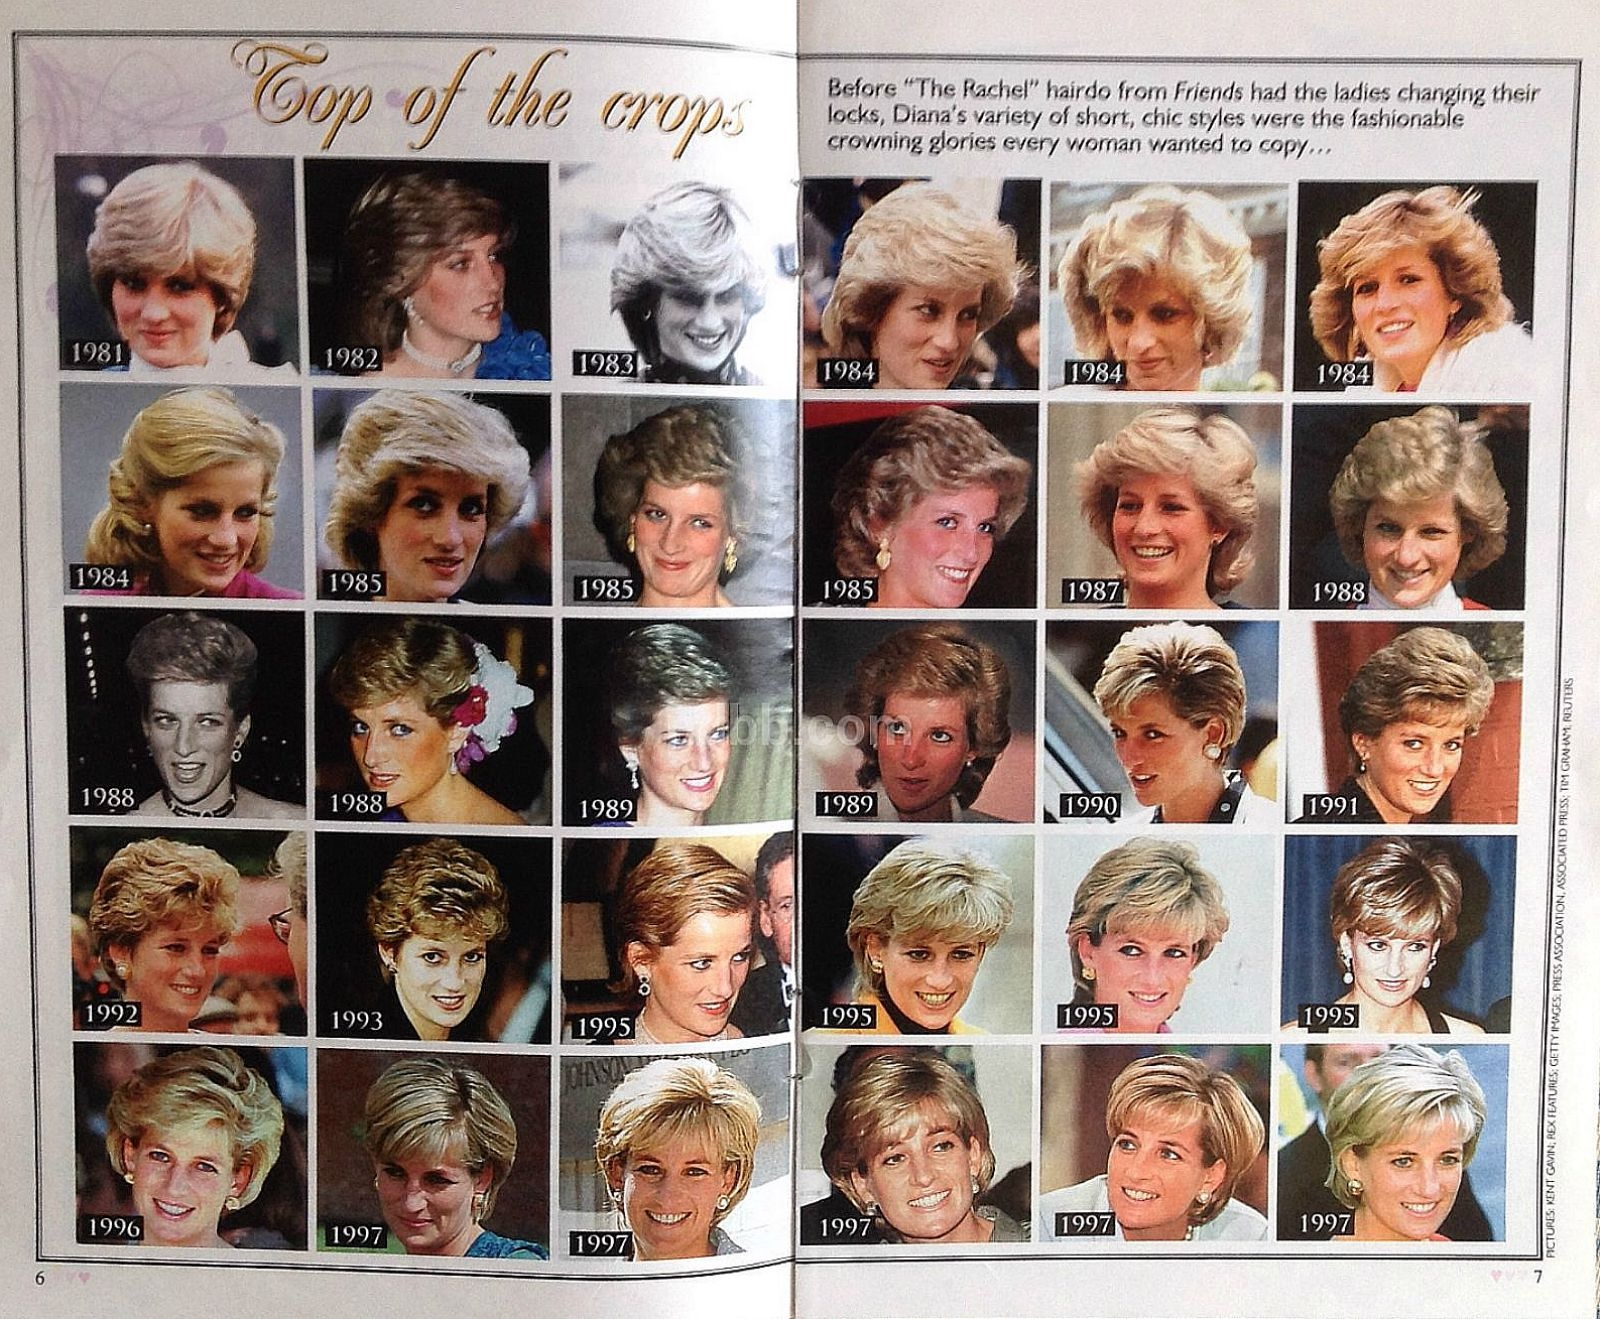 Todays Princess Diana Article Is Top Of The Crops Princess